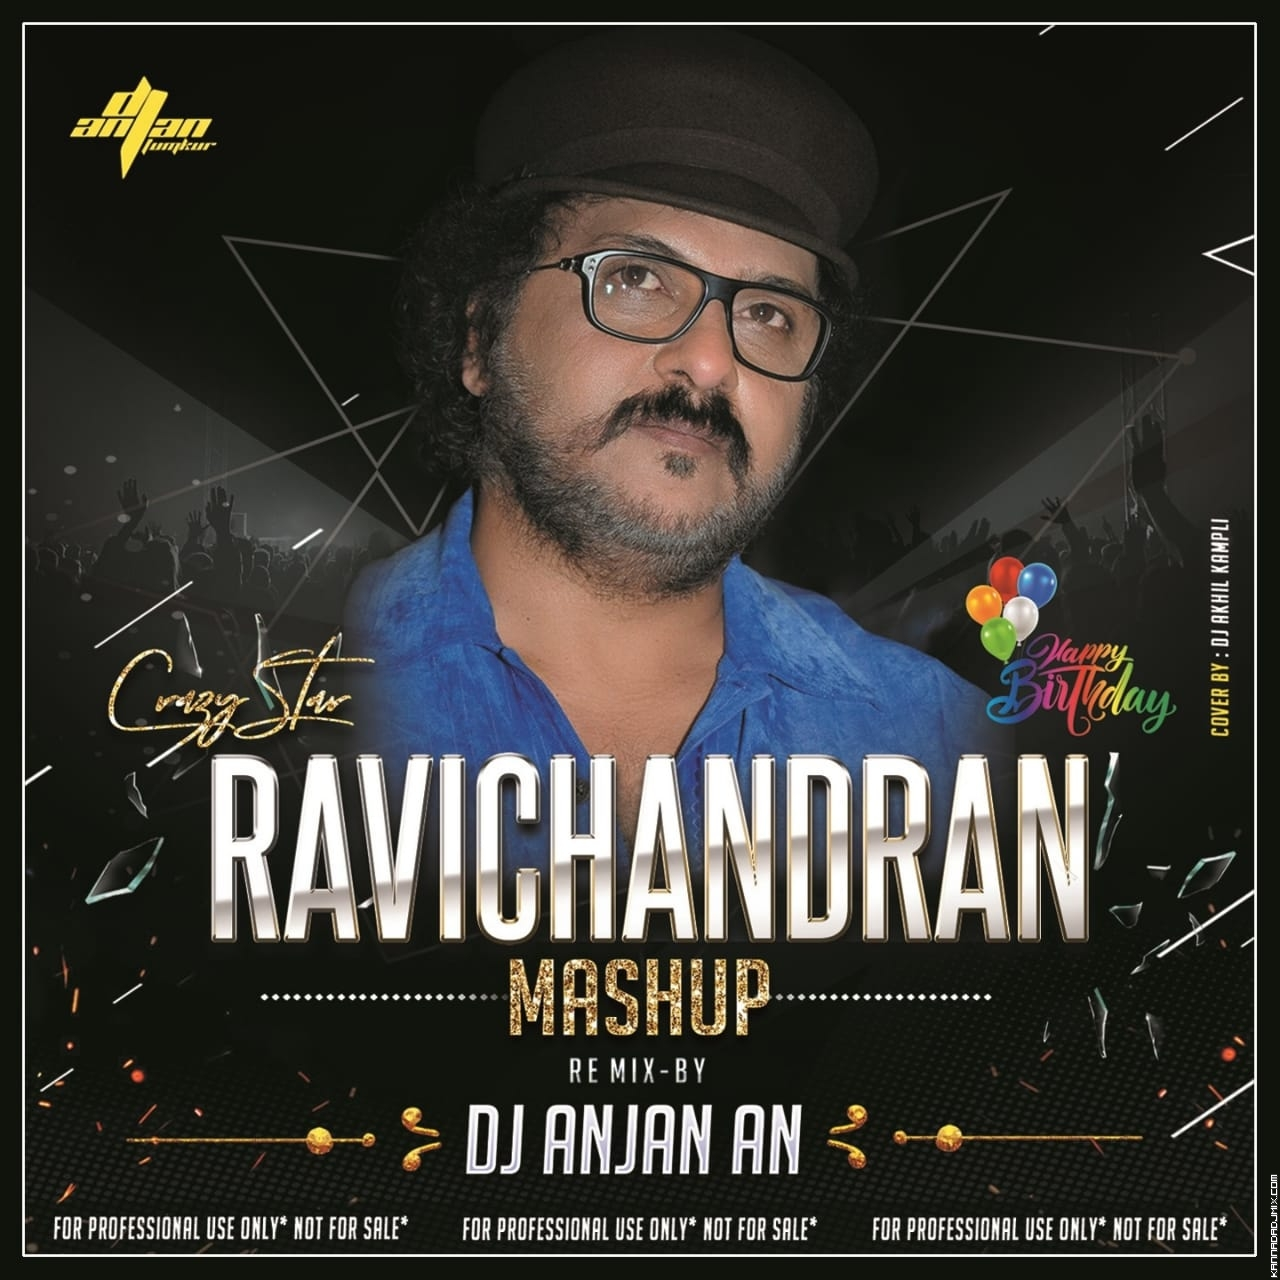 Ravichandran Mashup 2020 [An Production Tumakur].mp3